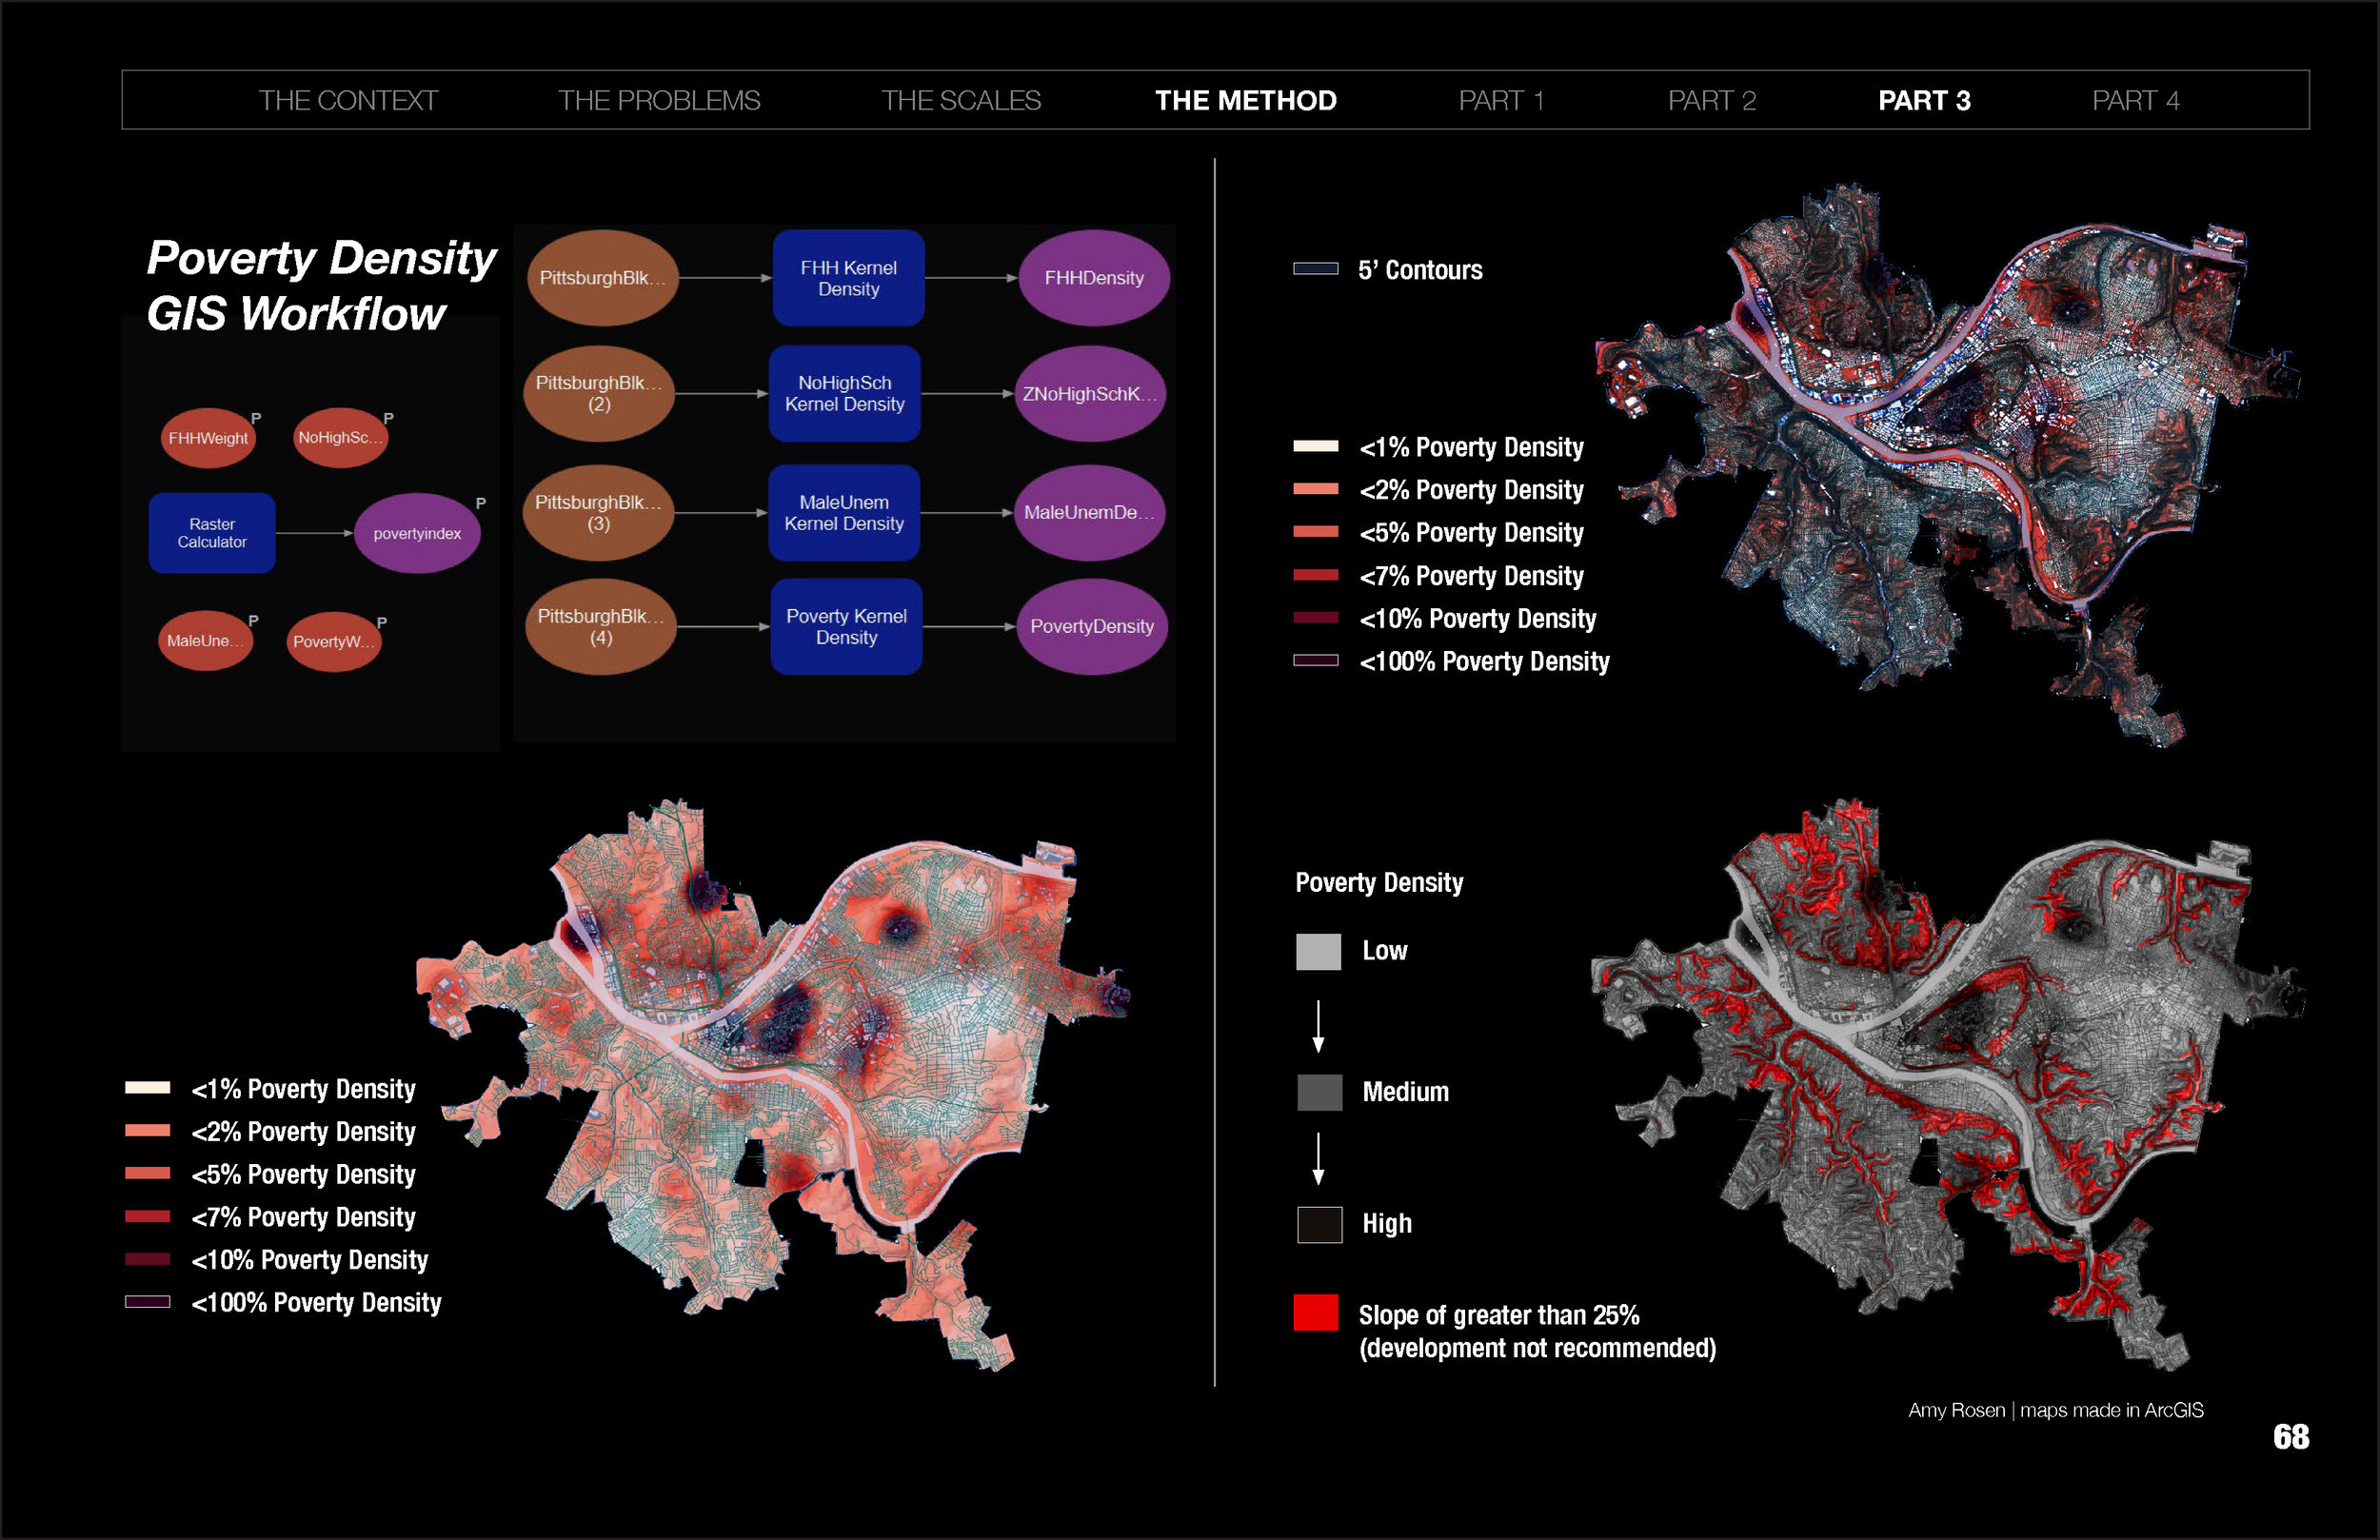 Rosen_MSSD_Final Presentation_1.08_Page_068.jpg